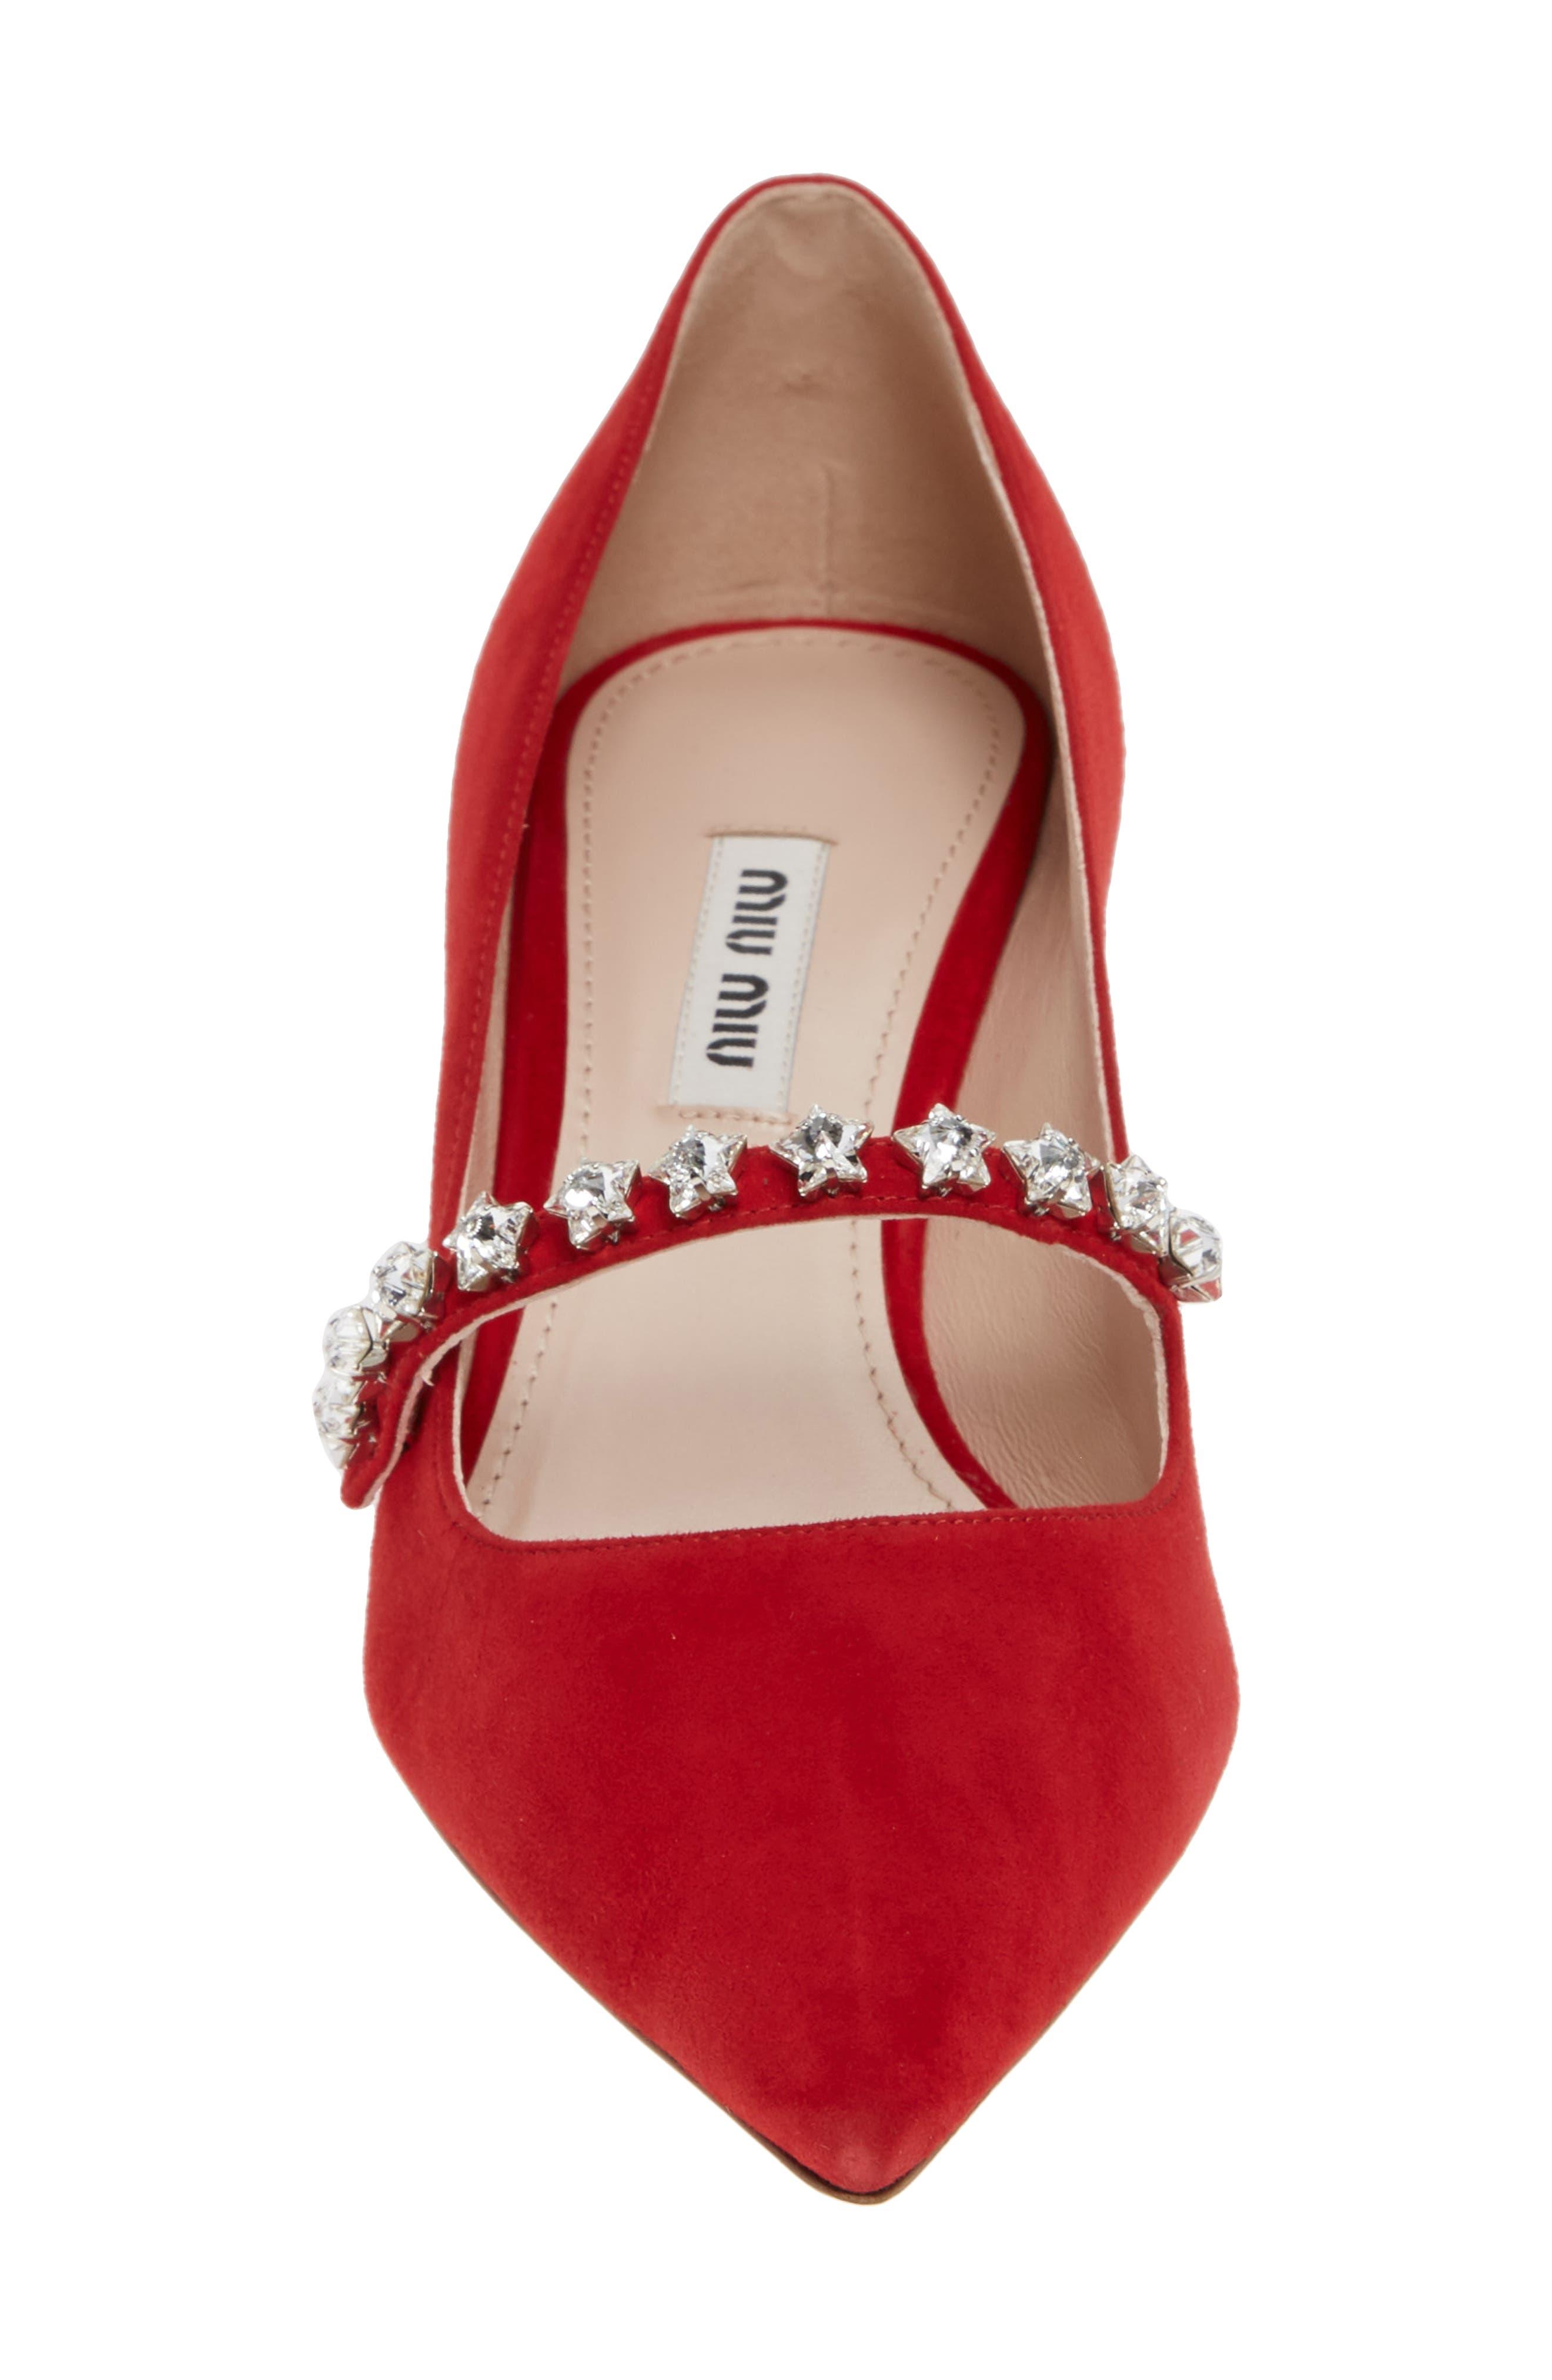 MIU MIU,                             Jewel Star Mary Jane Pump,                             Alternate thumbnail 4, color,                             RED SUEDE